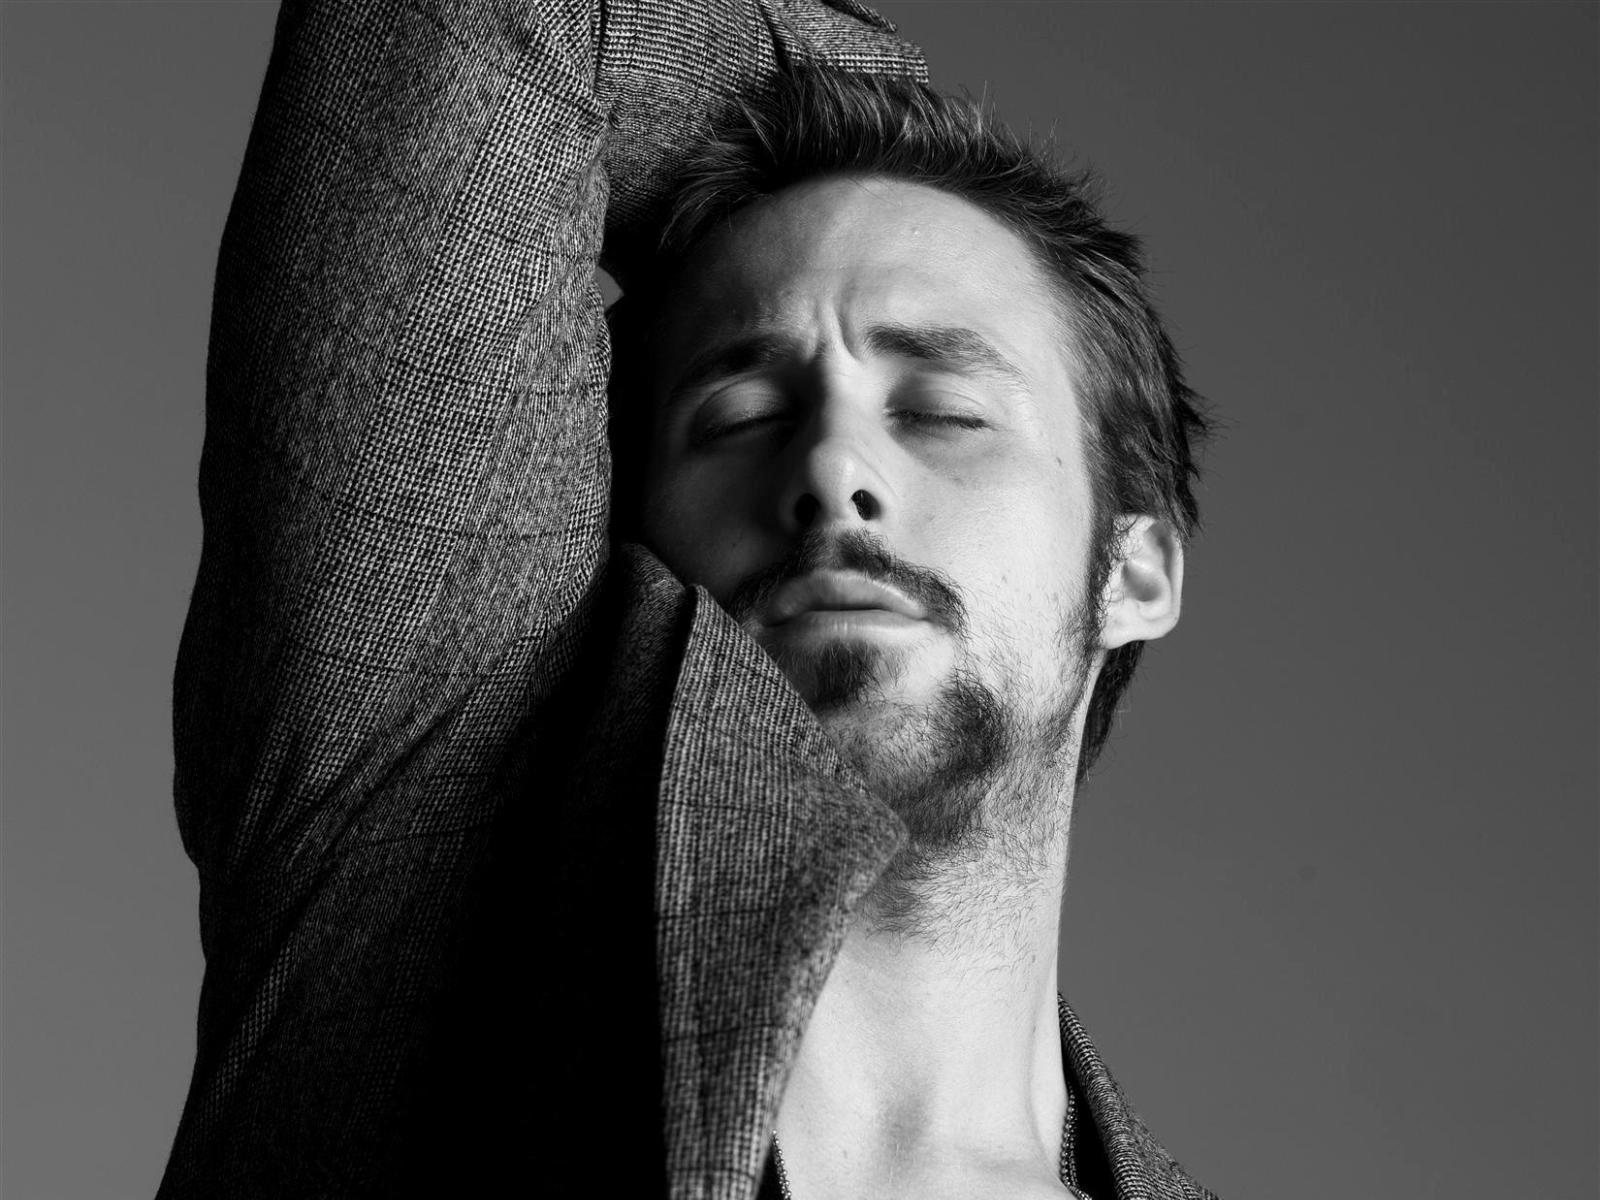 Ryan+Gosling+Cover+By+Maceme+Wallpaper.jpg 1,600×1,200